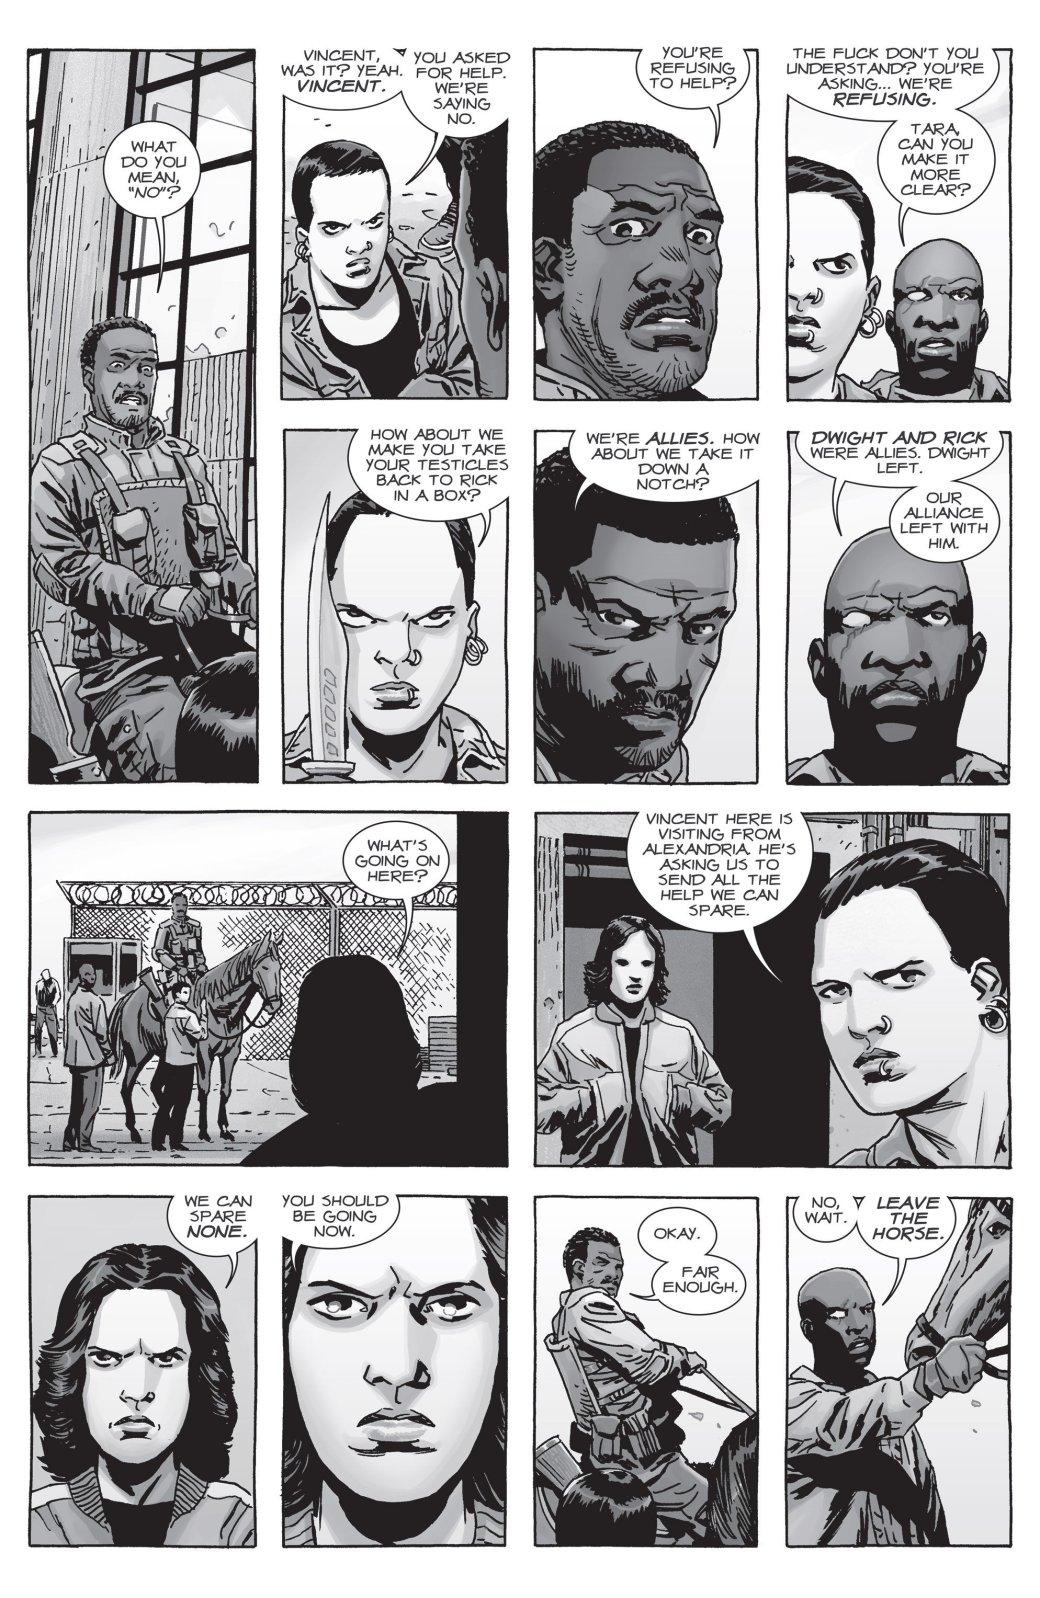 Война с Шепчущимися в комиксе The Walking Dead не оправдала ожиданий | Канобу - Изображение 9